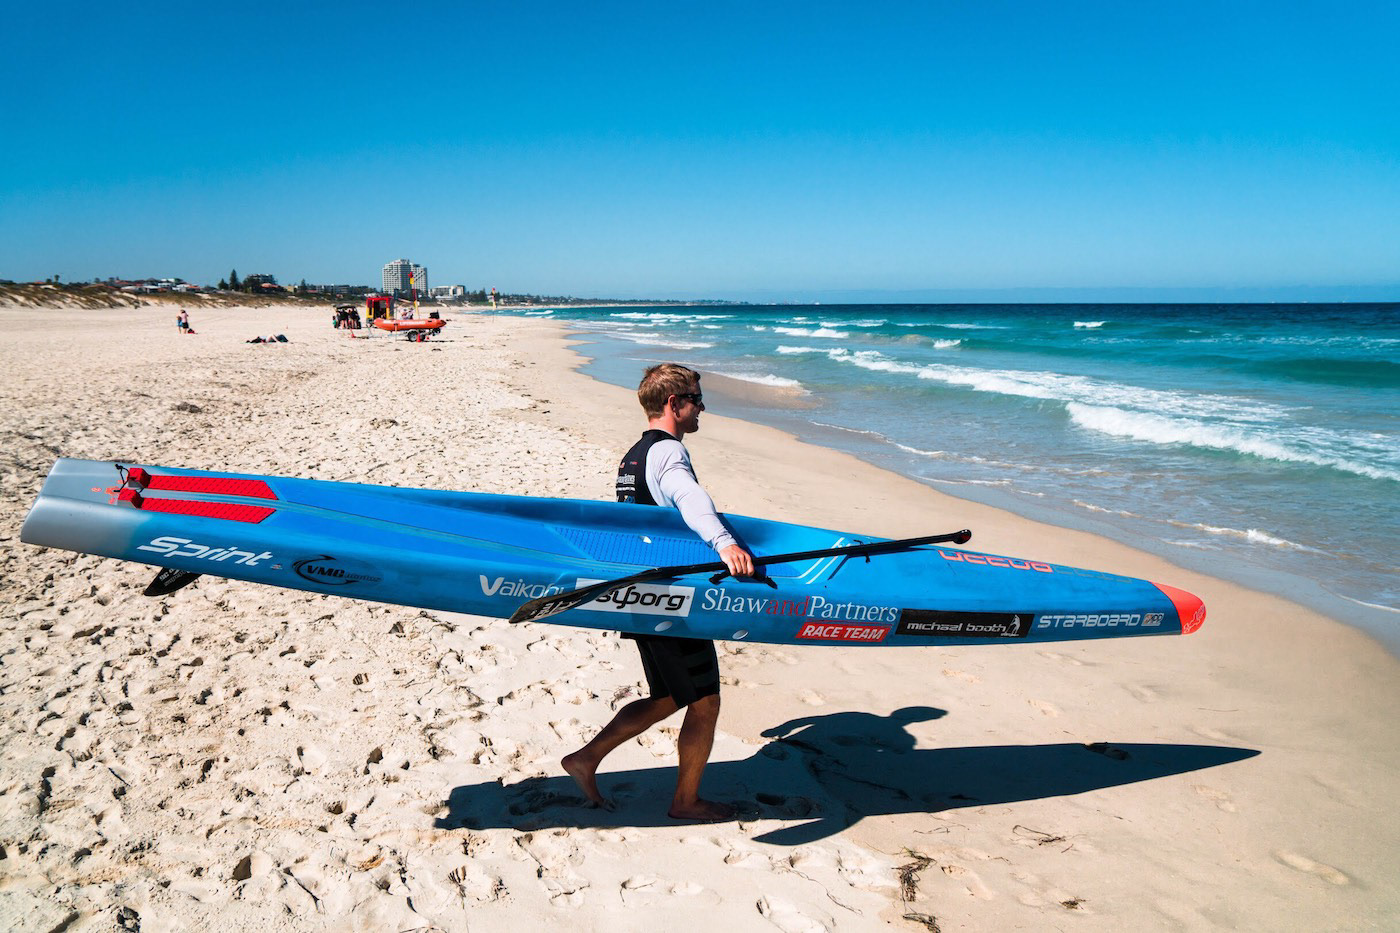 Carolina Cup wrightsville beach north carolina Blockade Runner Resort starboard Standup Paddleboard Australia Paddle League app World Paddle Association